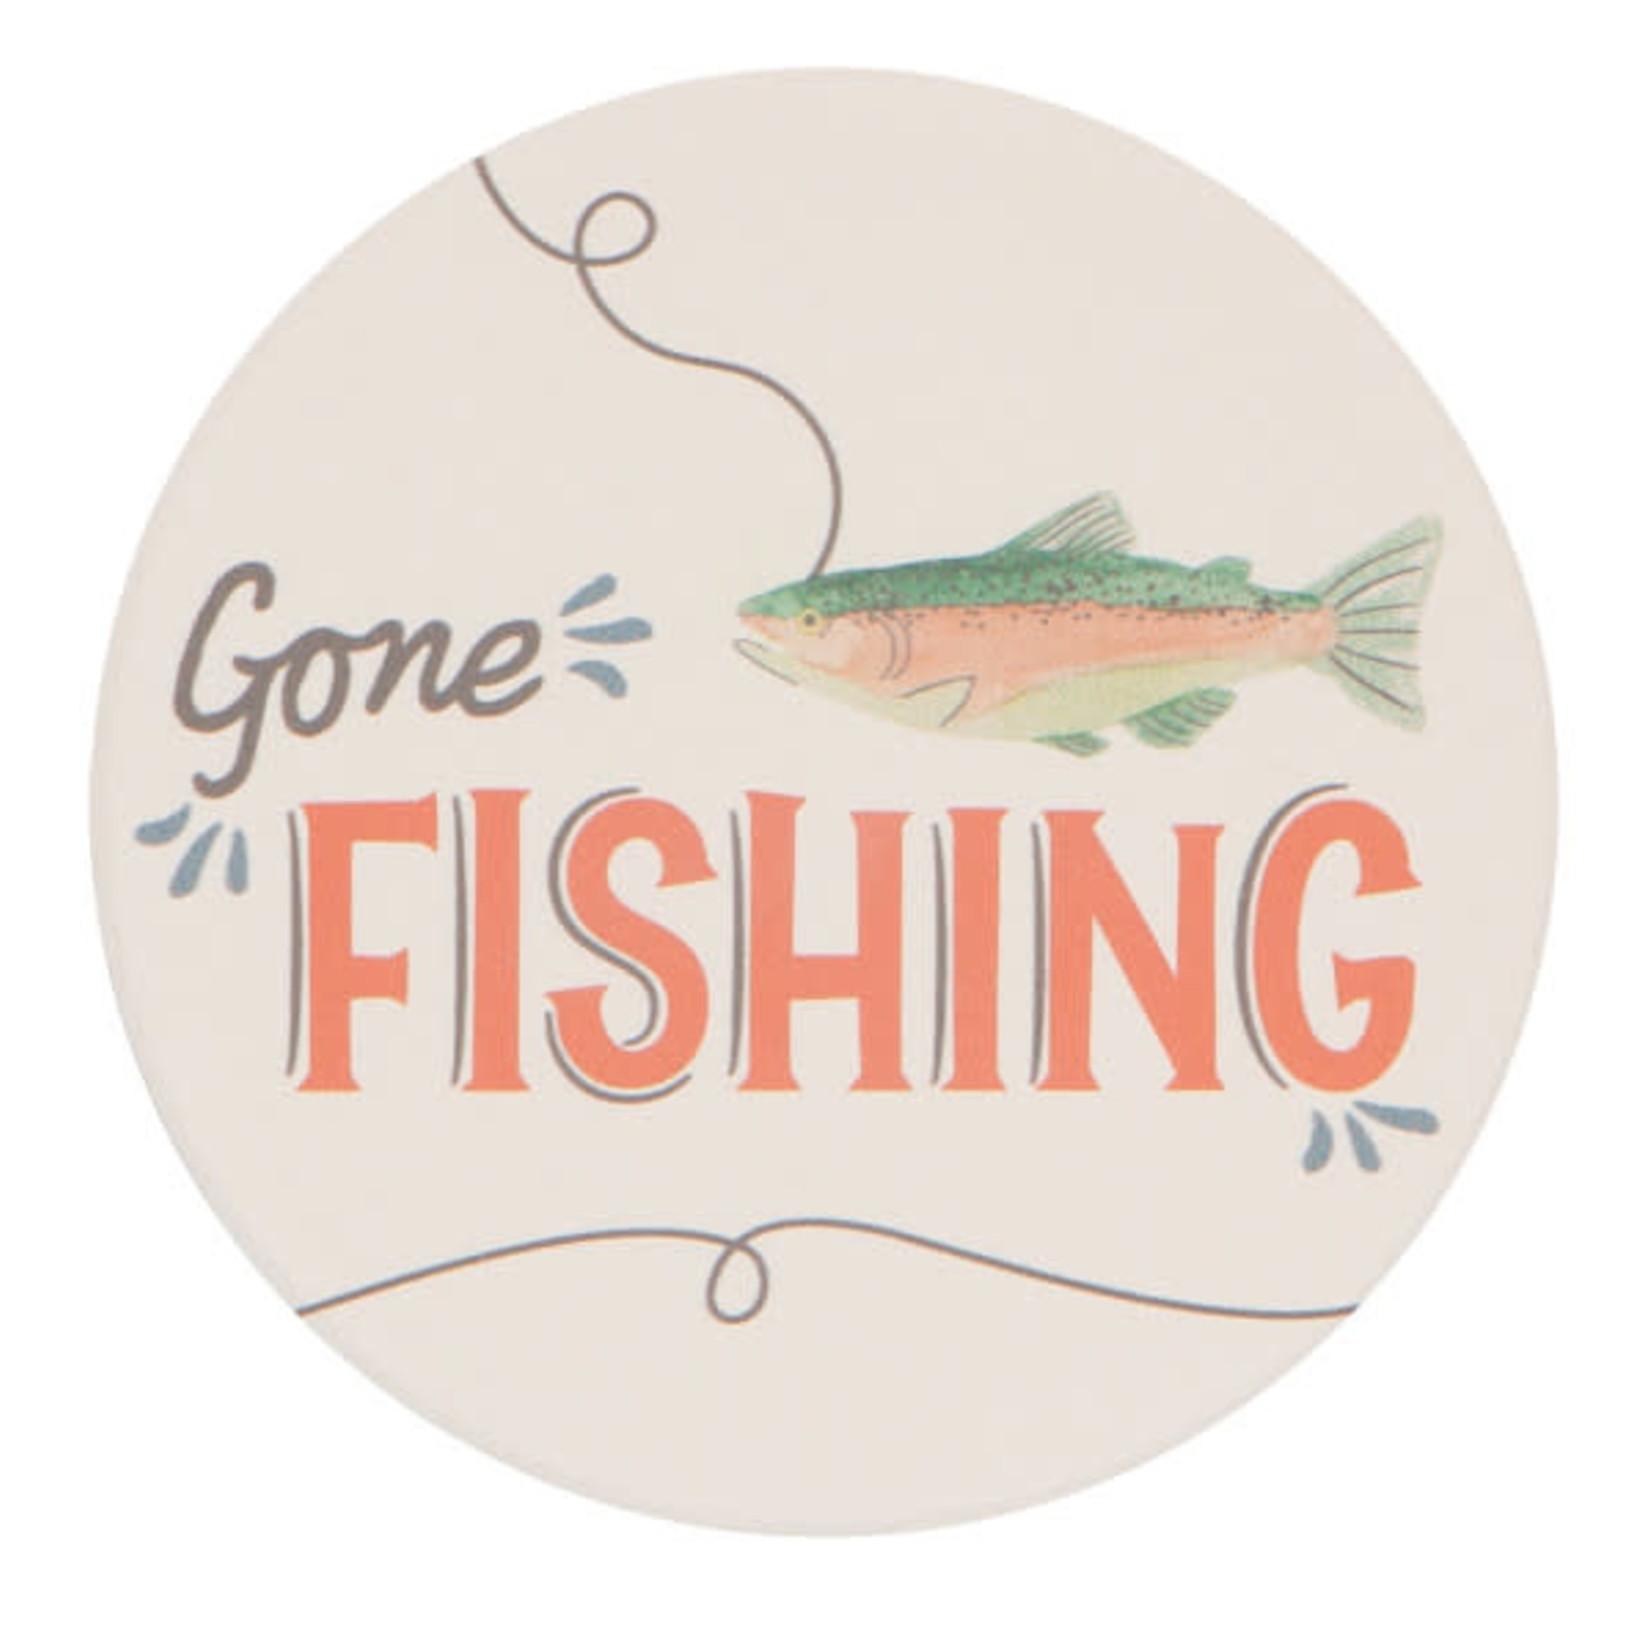 Gone Fishing Coasters